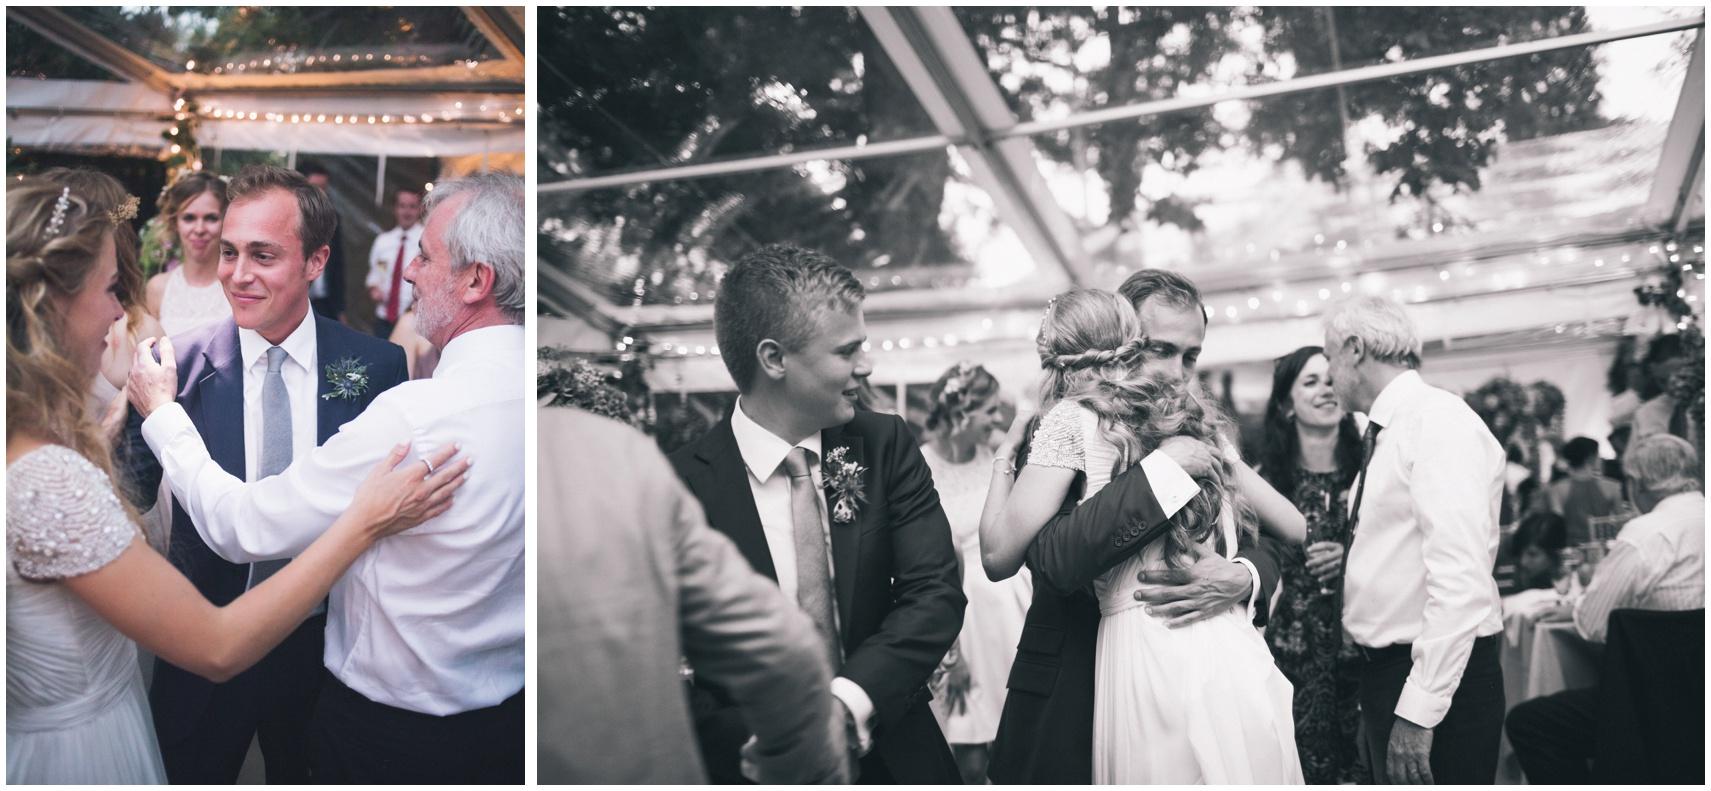 BMC Wedding photography Rutland_0351.jpg